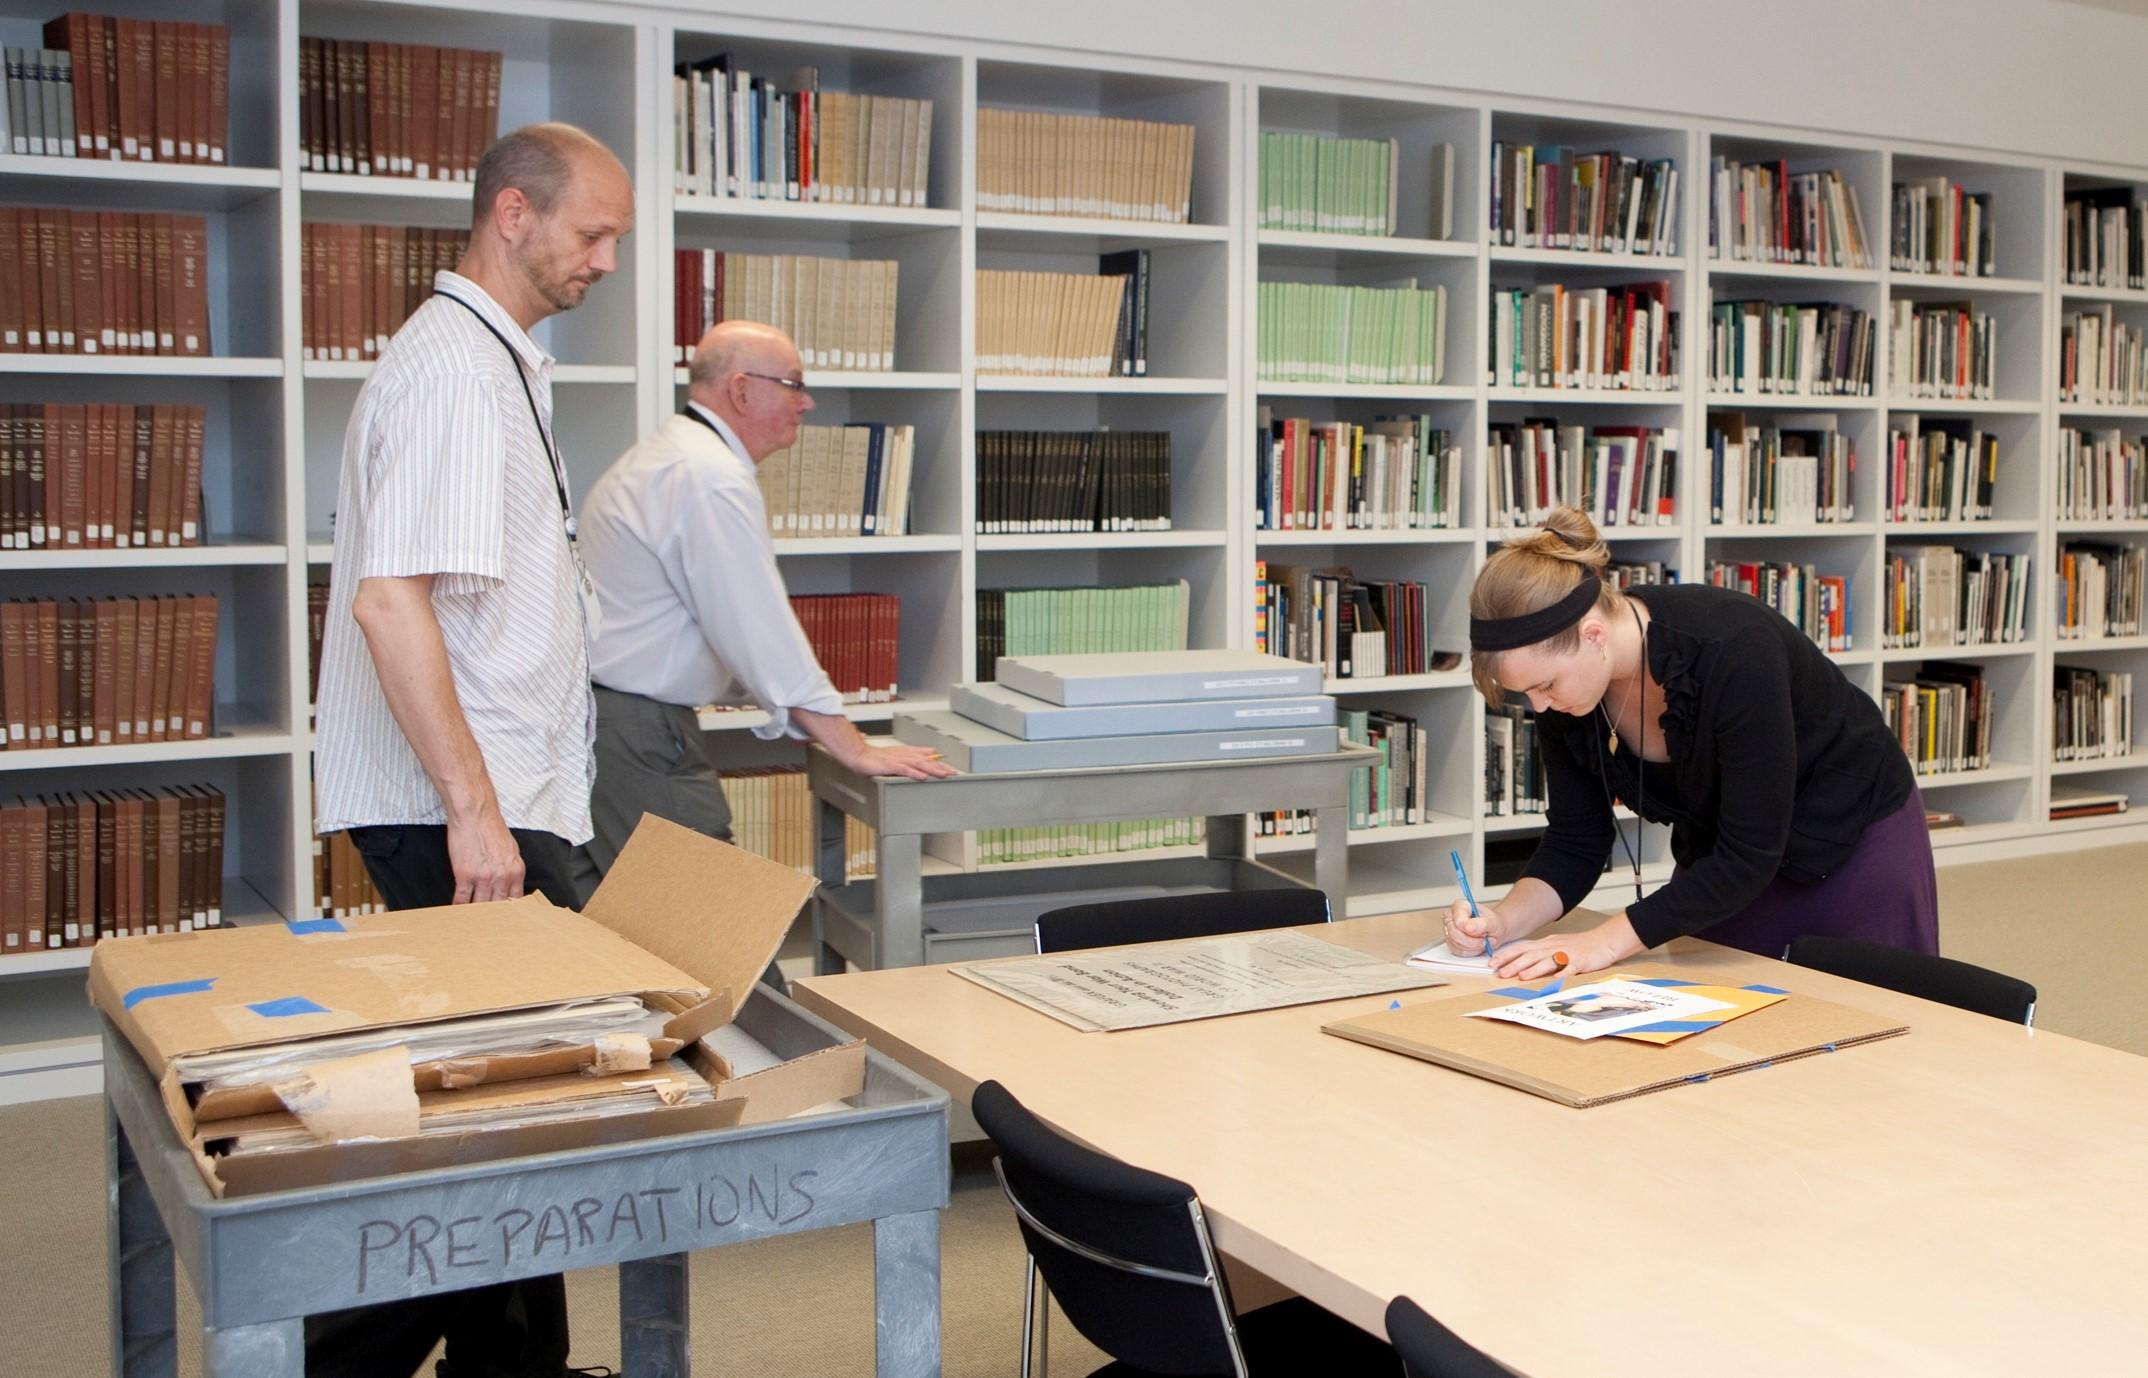 Works on Paper Study Center (blog post)